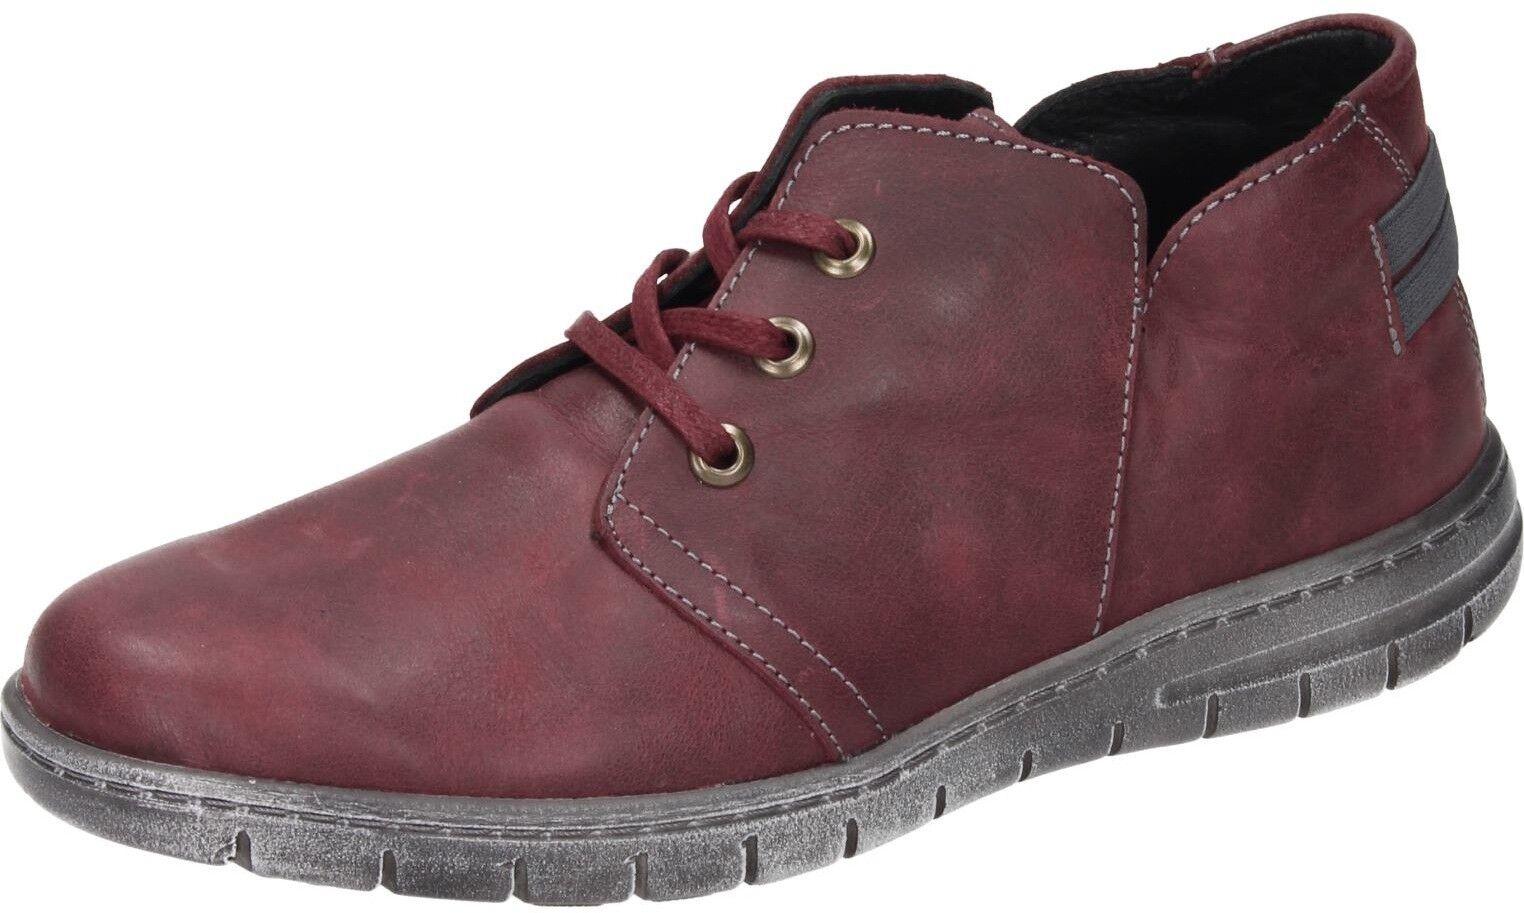 Comfortabel Damen Schuhe Damen-Stiefelette rot Leder 991243